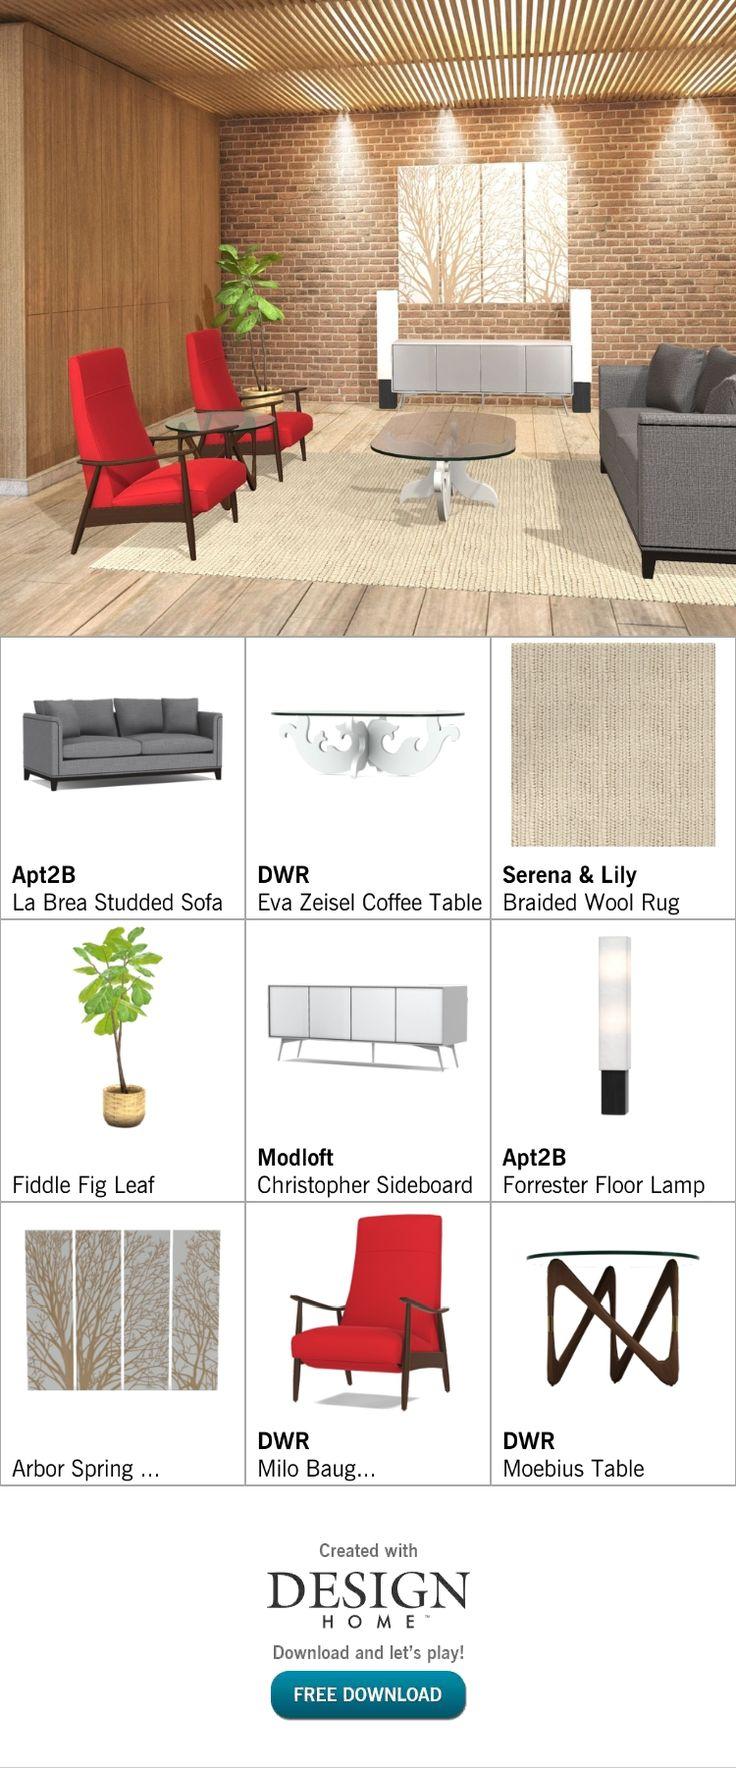 10 best Design Home Creations images on Pinterest | Design homes ...